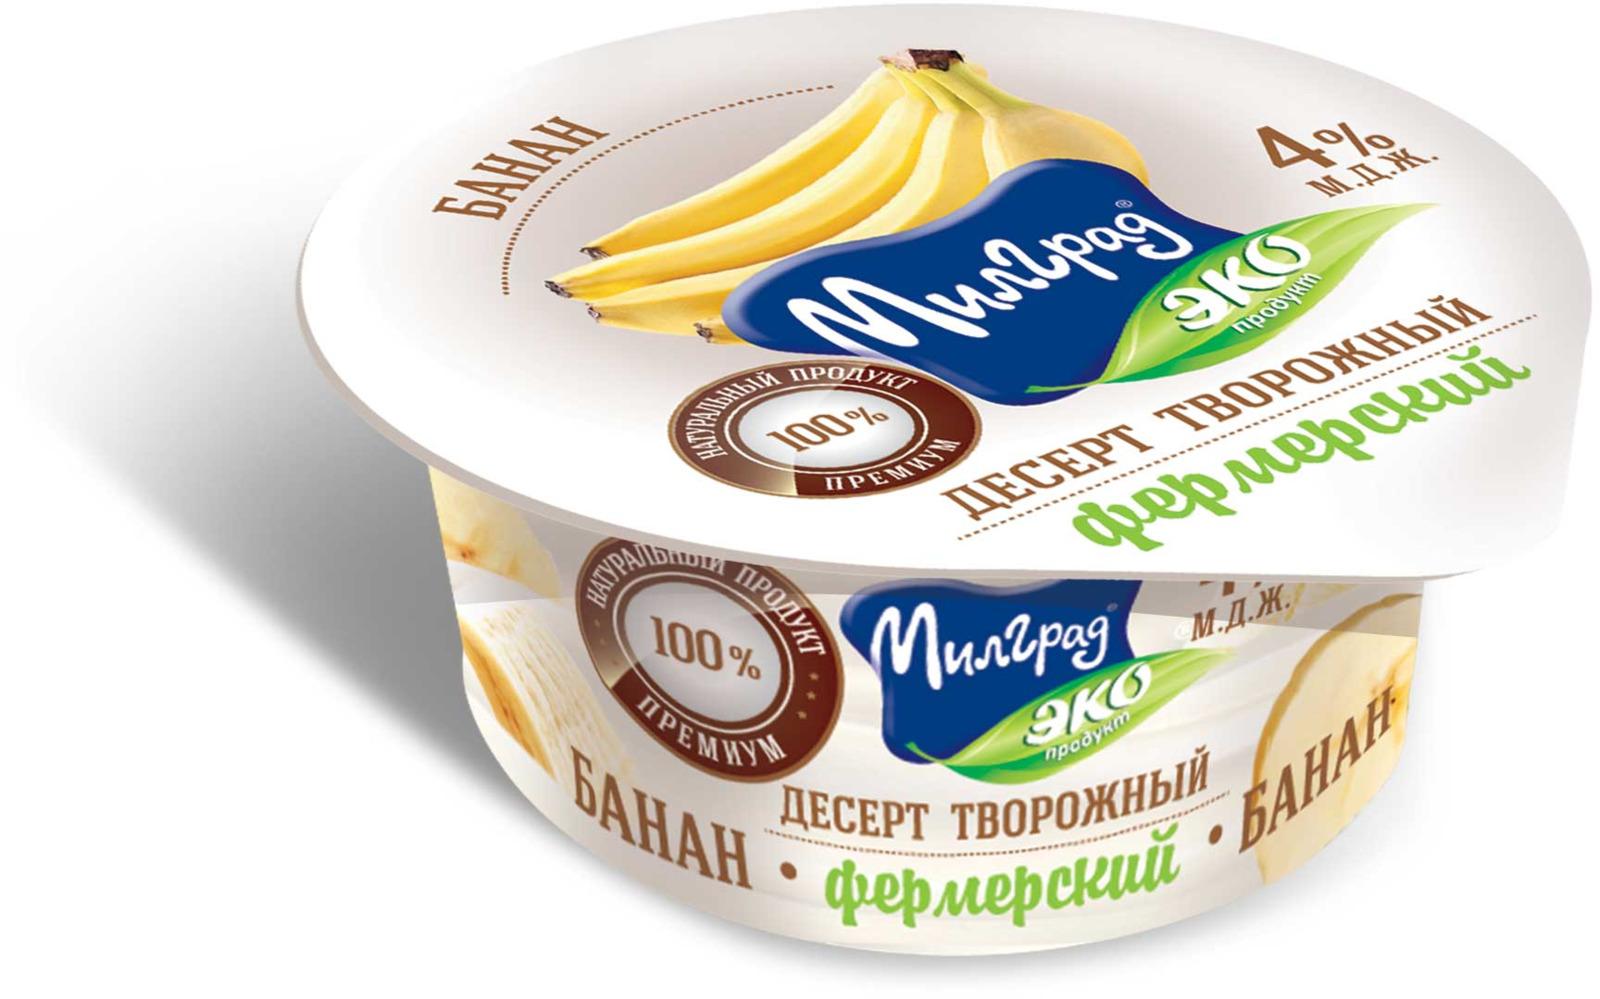 Милград Десерт творожный фермерский Банан, 130 г Милград